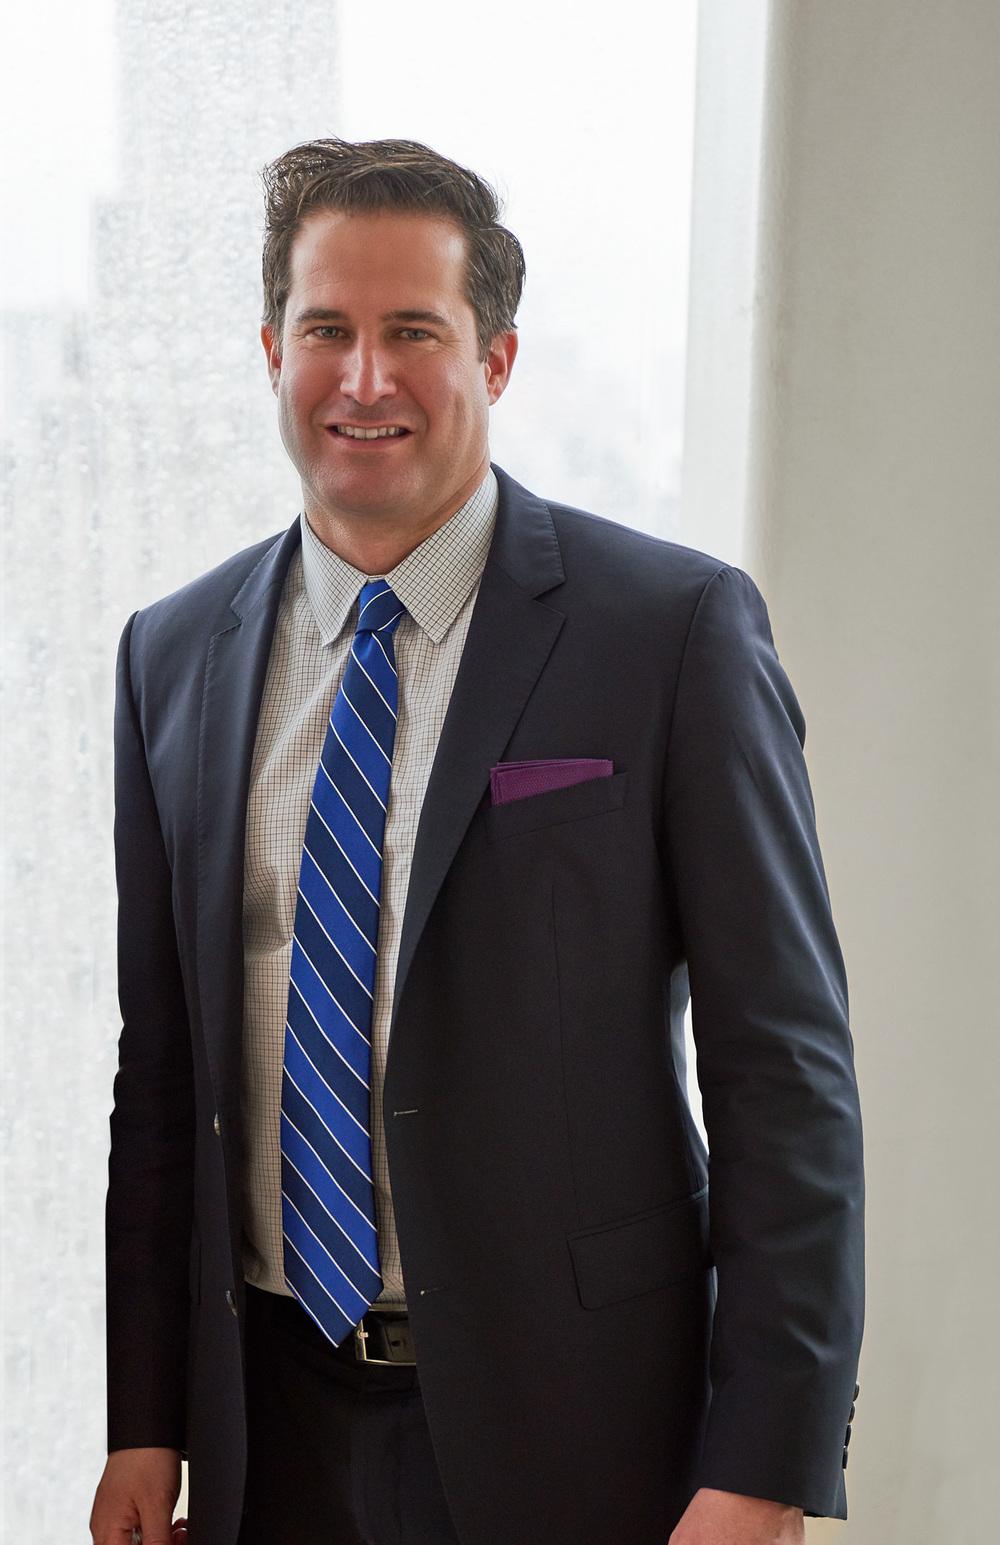 U.S. Representative Seth Moulton, 6th Congressional District of Massachusetts.